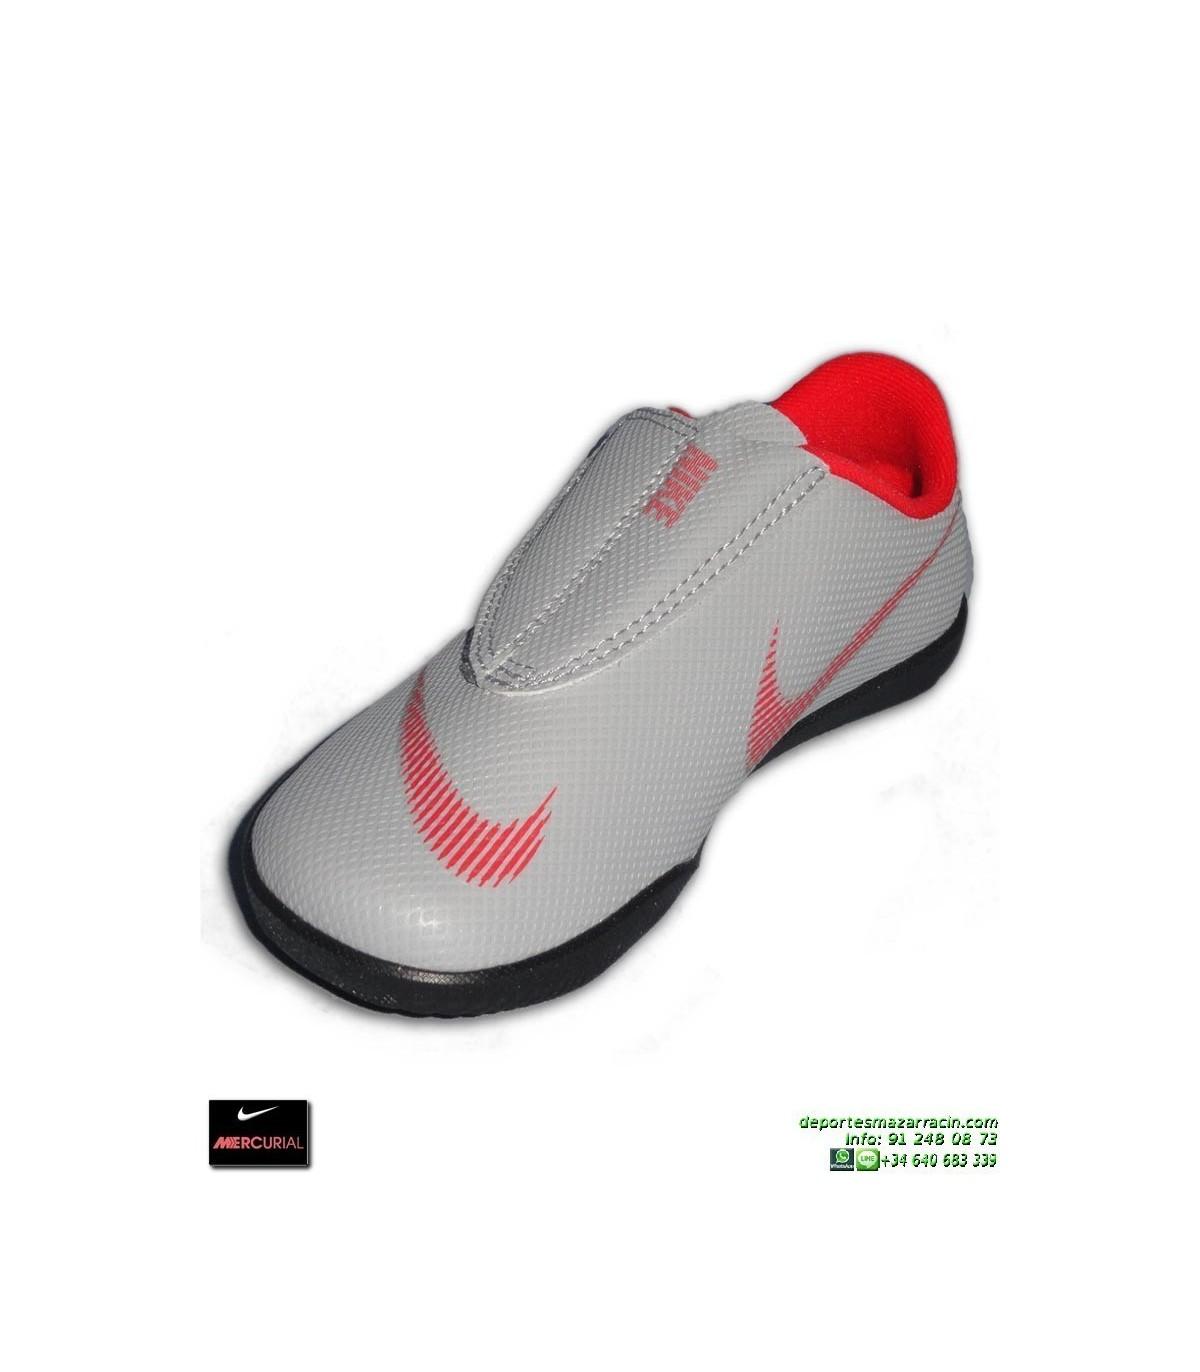 dc0b44c46 Nike MERCURIAL VAPOR 12 CLUB Niño Gris Zapatilla Futbol Sala Velcro  AH7356-060 bota junior · Nike MERCURIAL VAPOR 12 CLUB ...